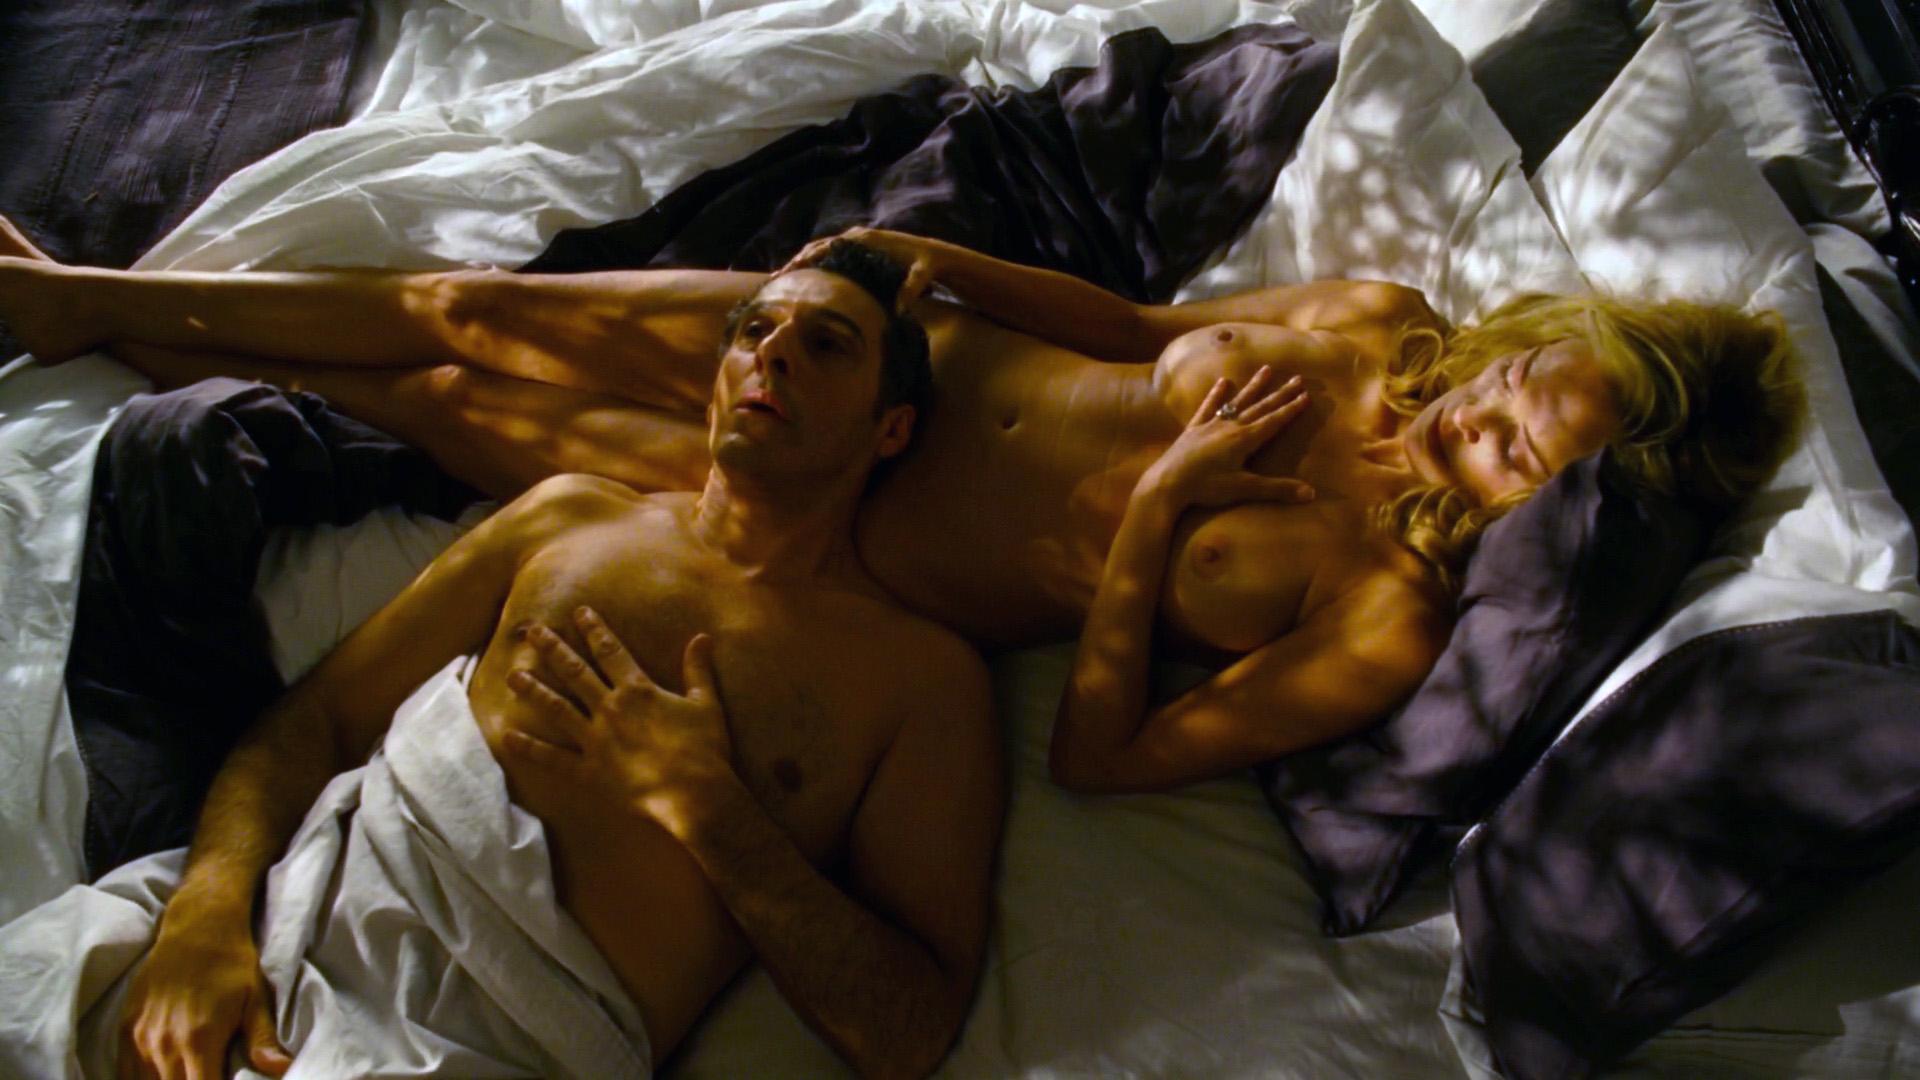 seksualnye kadry kino 90